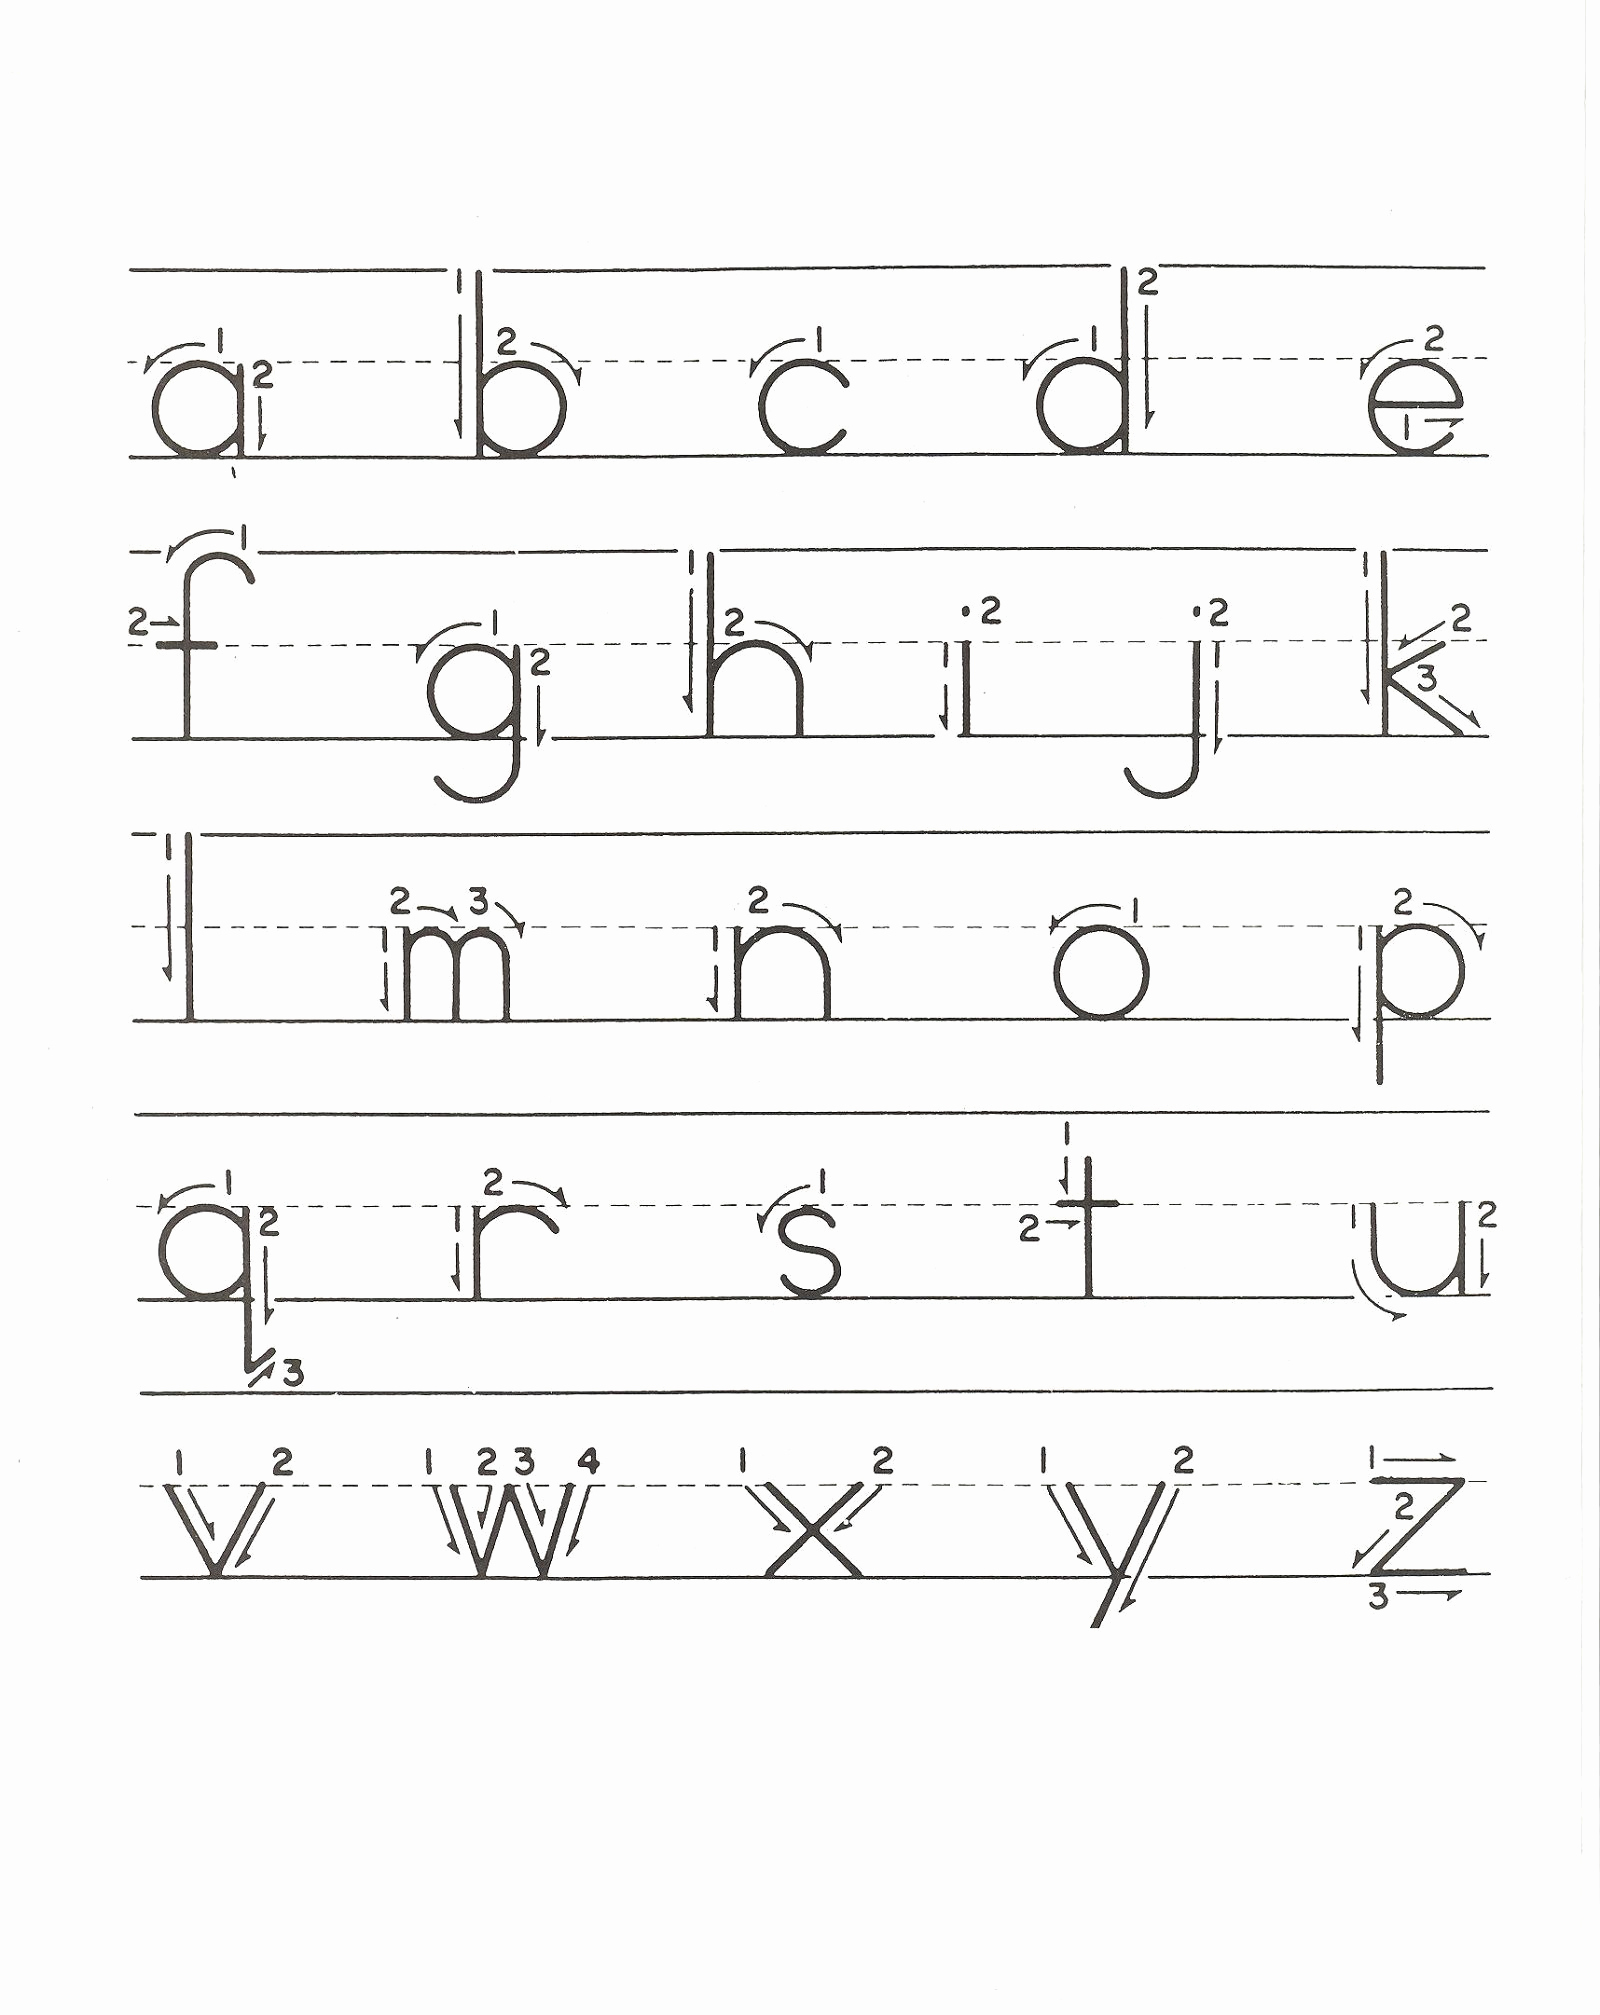 Kindergarten Lowercase Letters Worksheets Inspirational Lower Case Alphabet Tracing Learning Kiddo Shelter